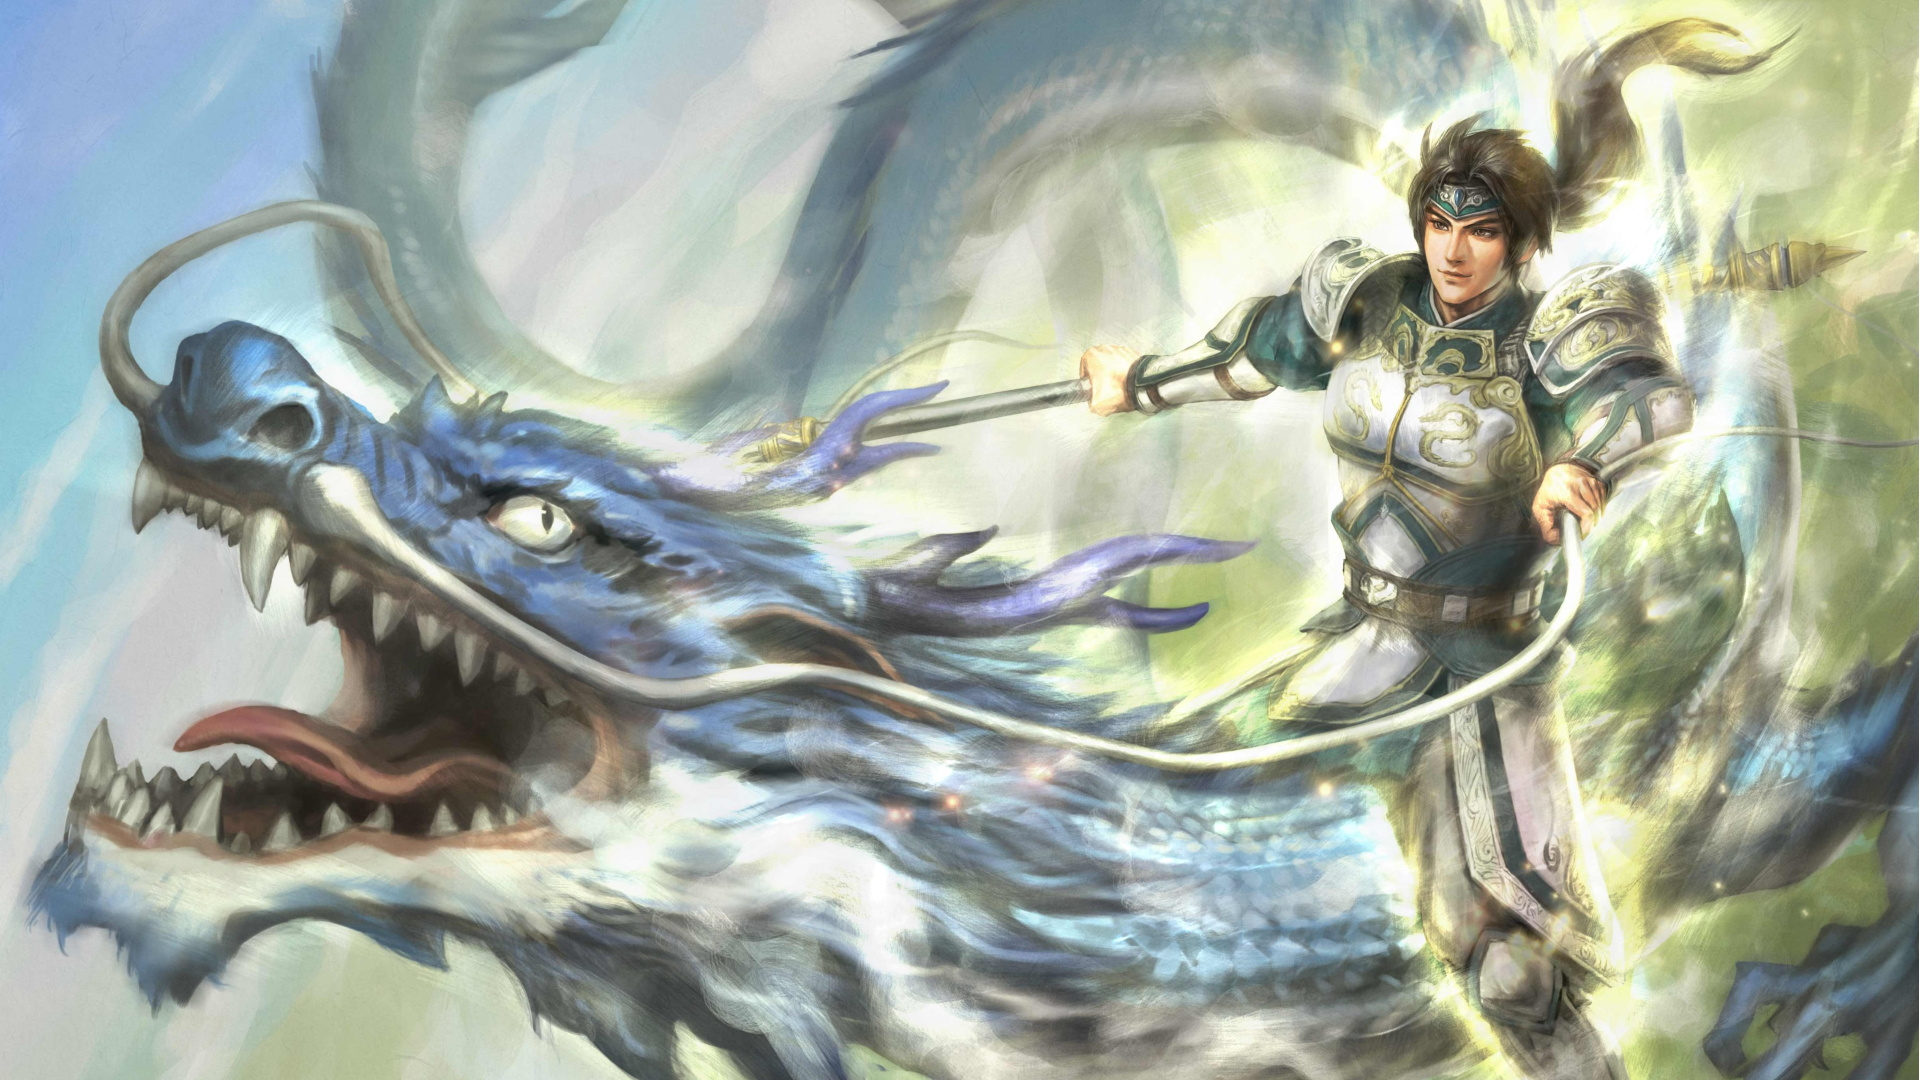 Koei Tecmo опубликовала трейлер и иллюстрацию к 20-летию серии Dynasty Warriors